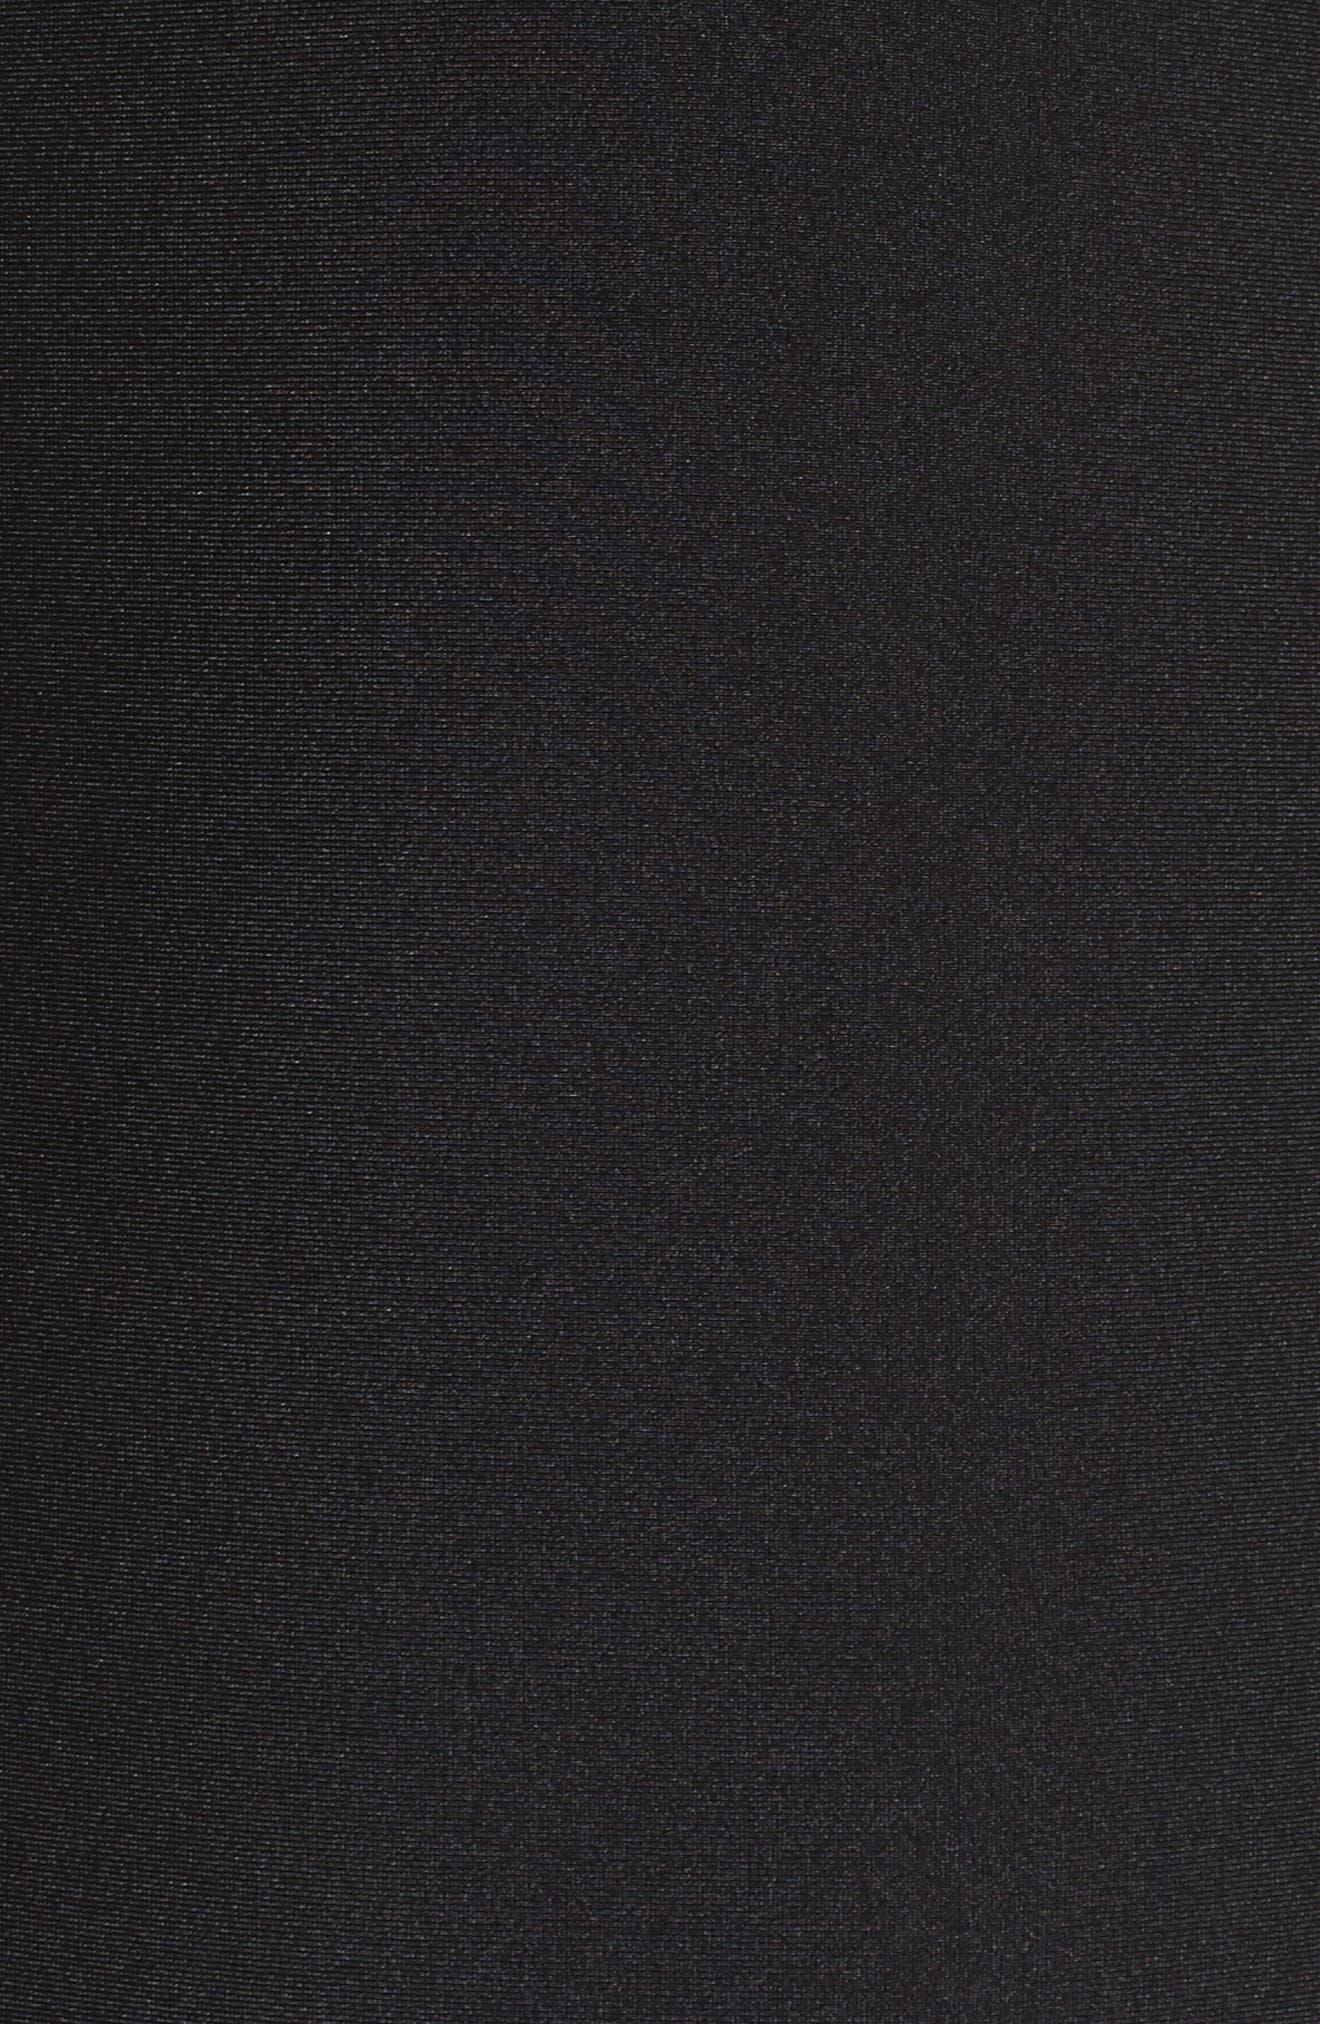 Anira Bandeau Swimsuit,                             Alternate thumbnail 5, color,                             Black